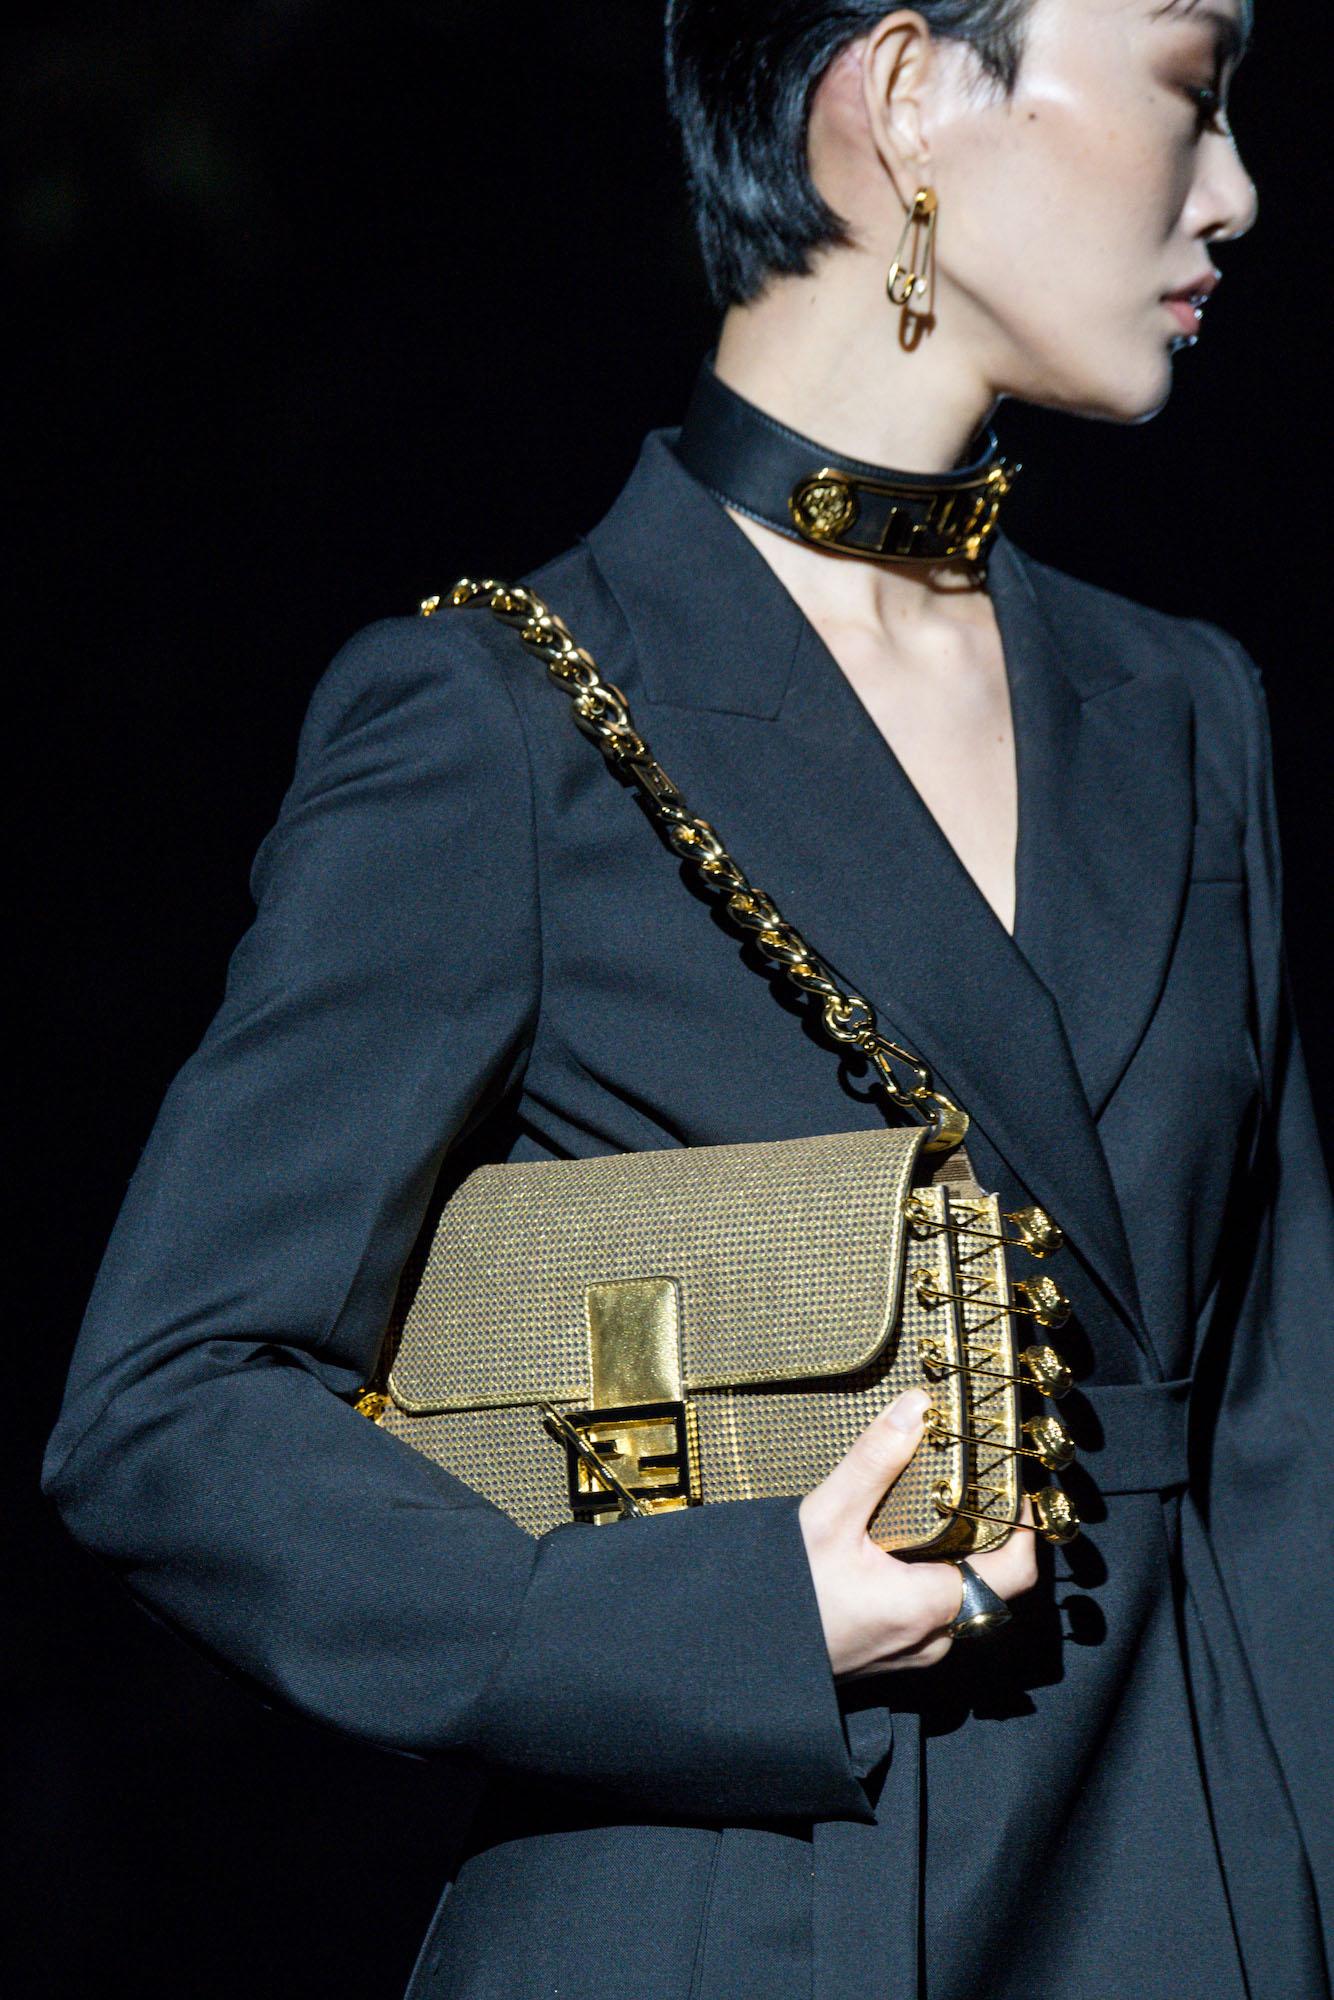 versace by fendi details (5)